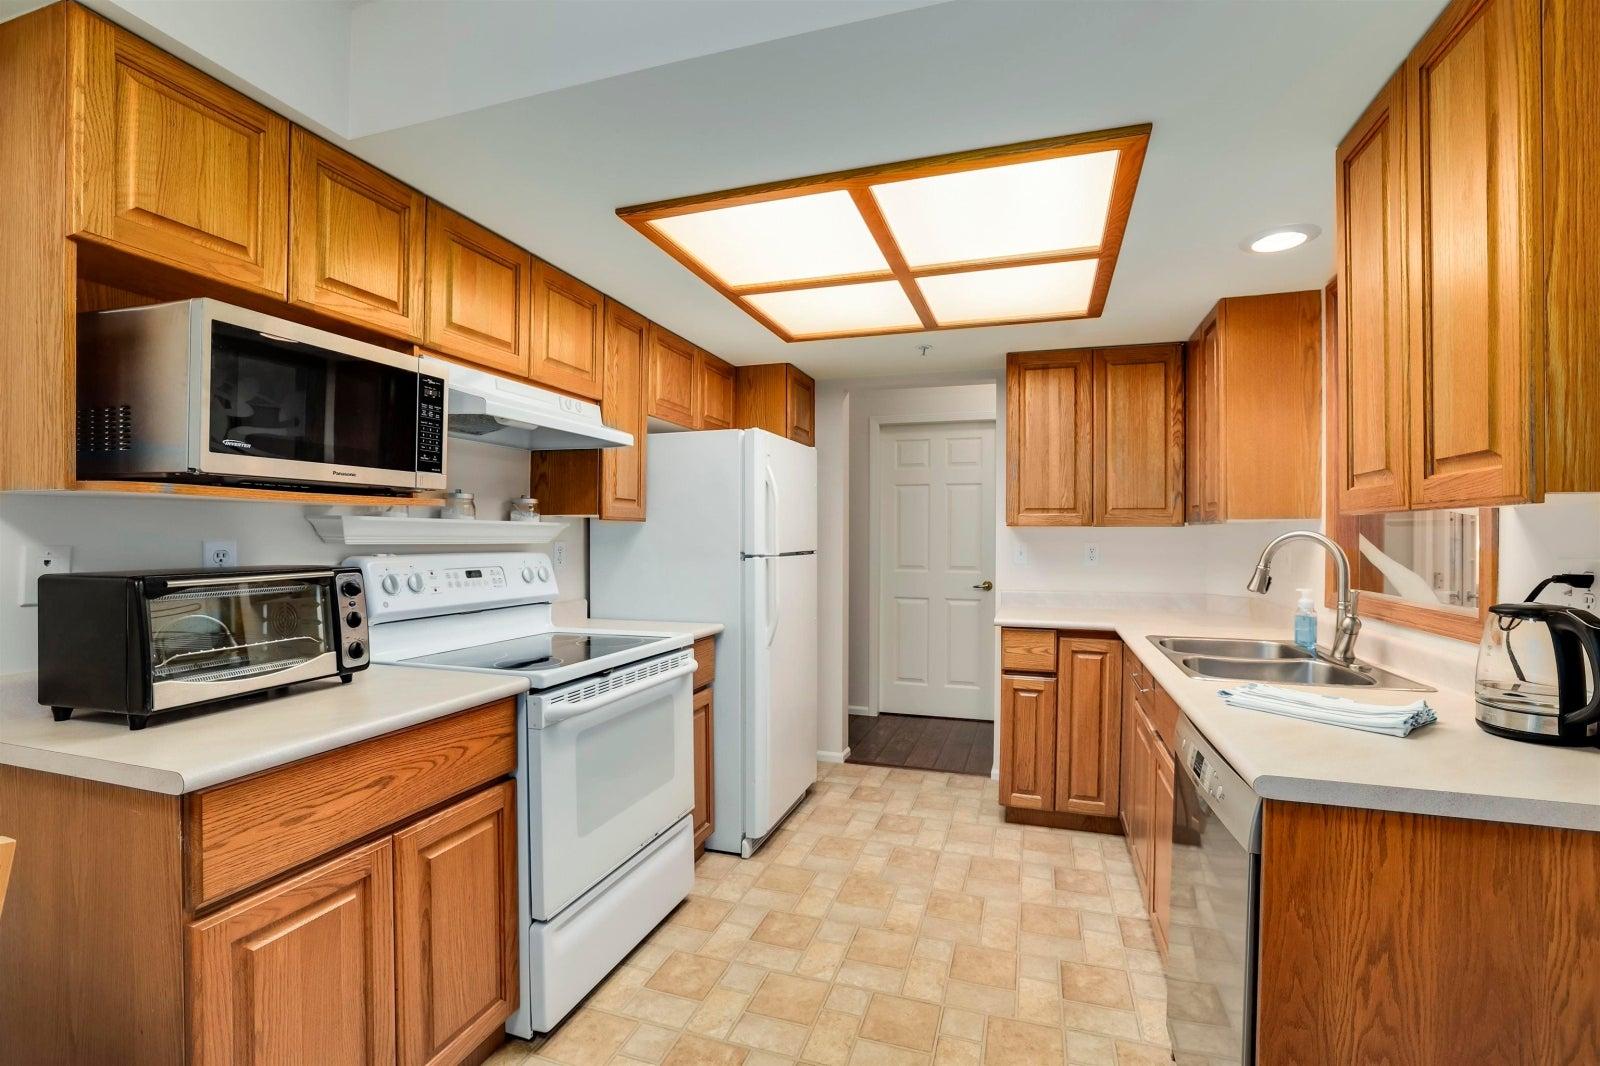 103 1132 DUFFERIN STREET - Eagle Ridge CQ Apartment/Condo for sale, 2 Bedrooms (R2618654) #8